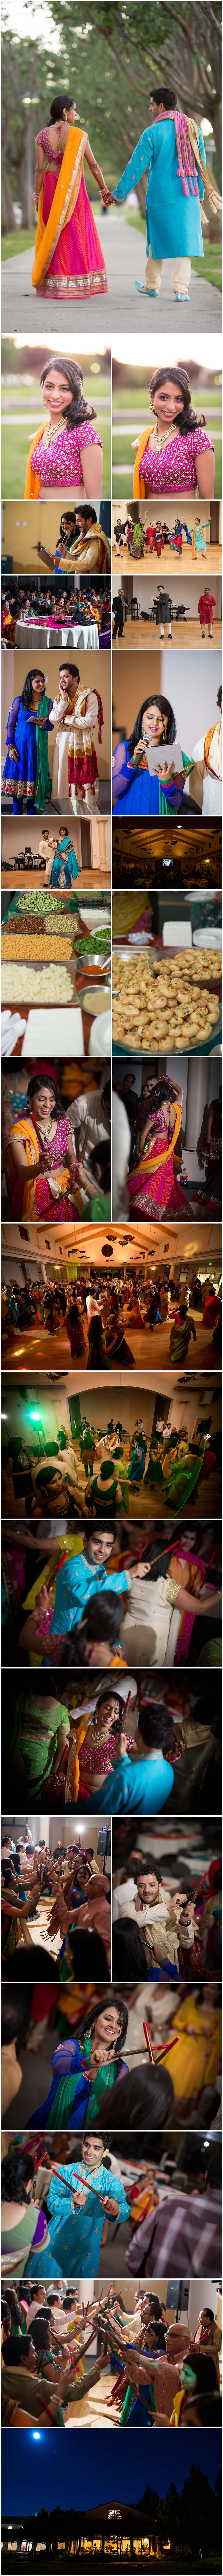 Indian Sangeet Cupertino Community center